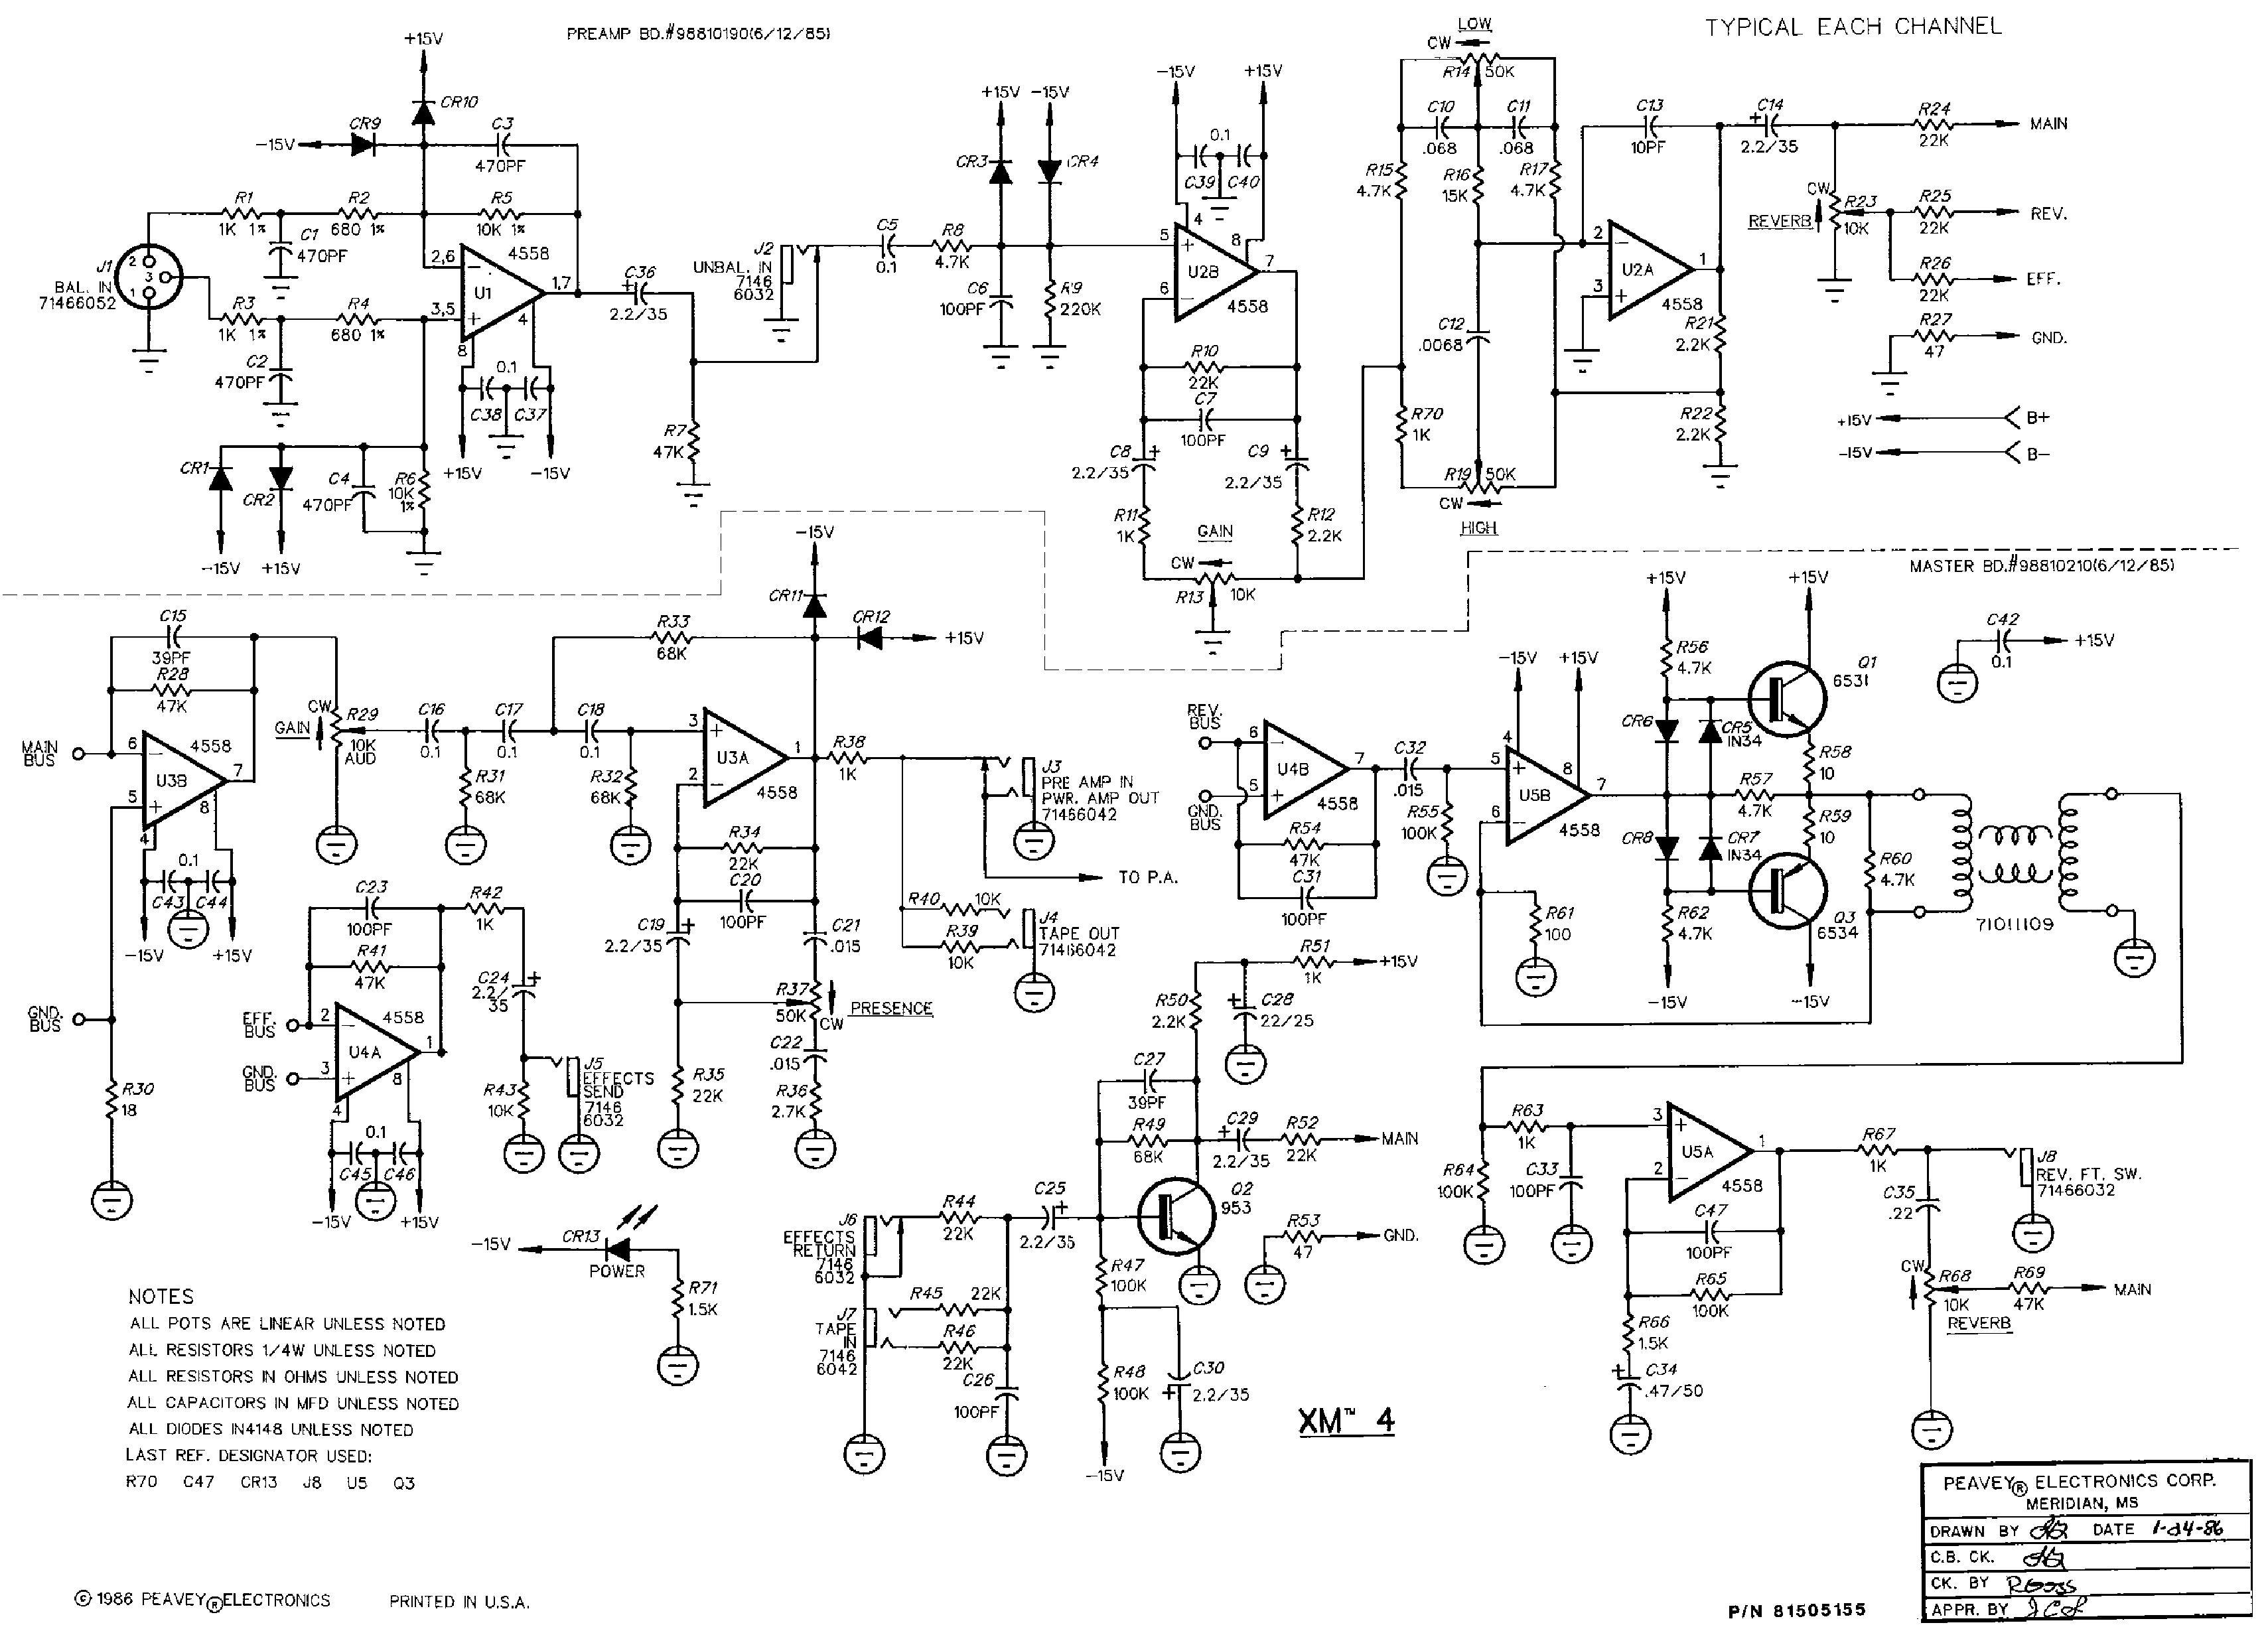 Wiring Diagram For Peavey Patriot